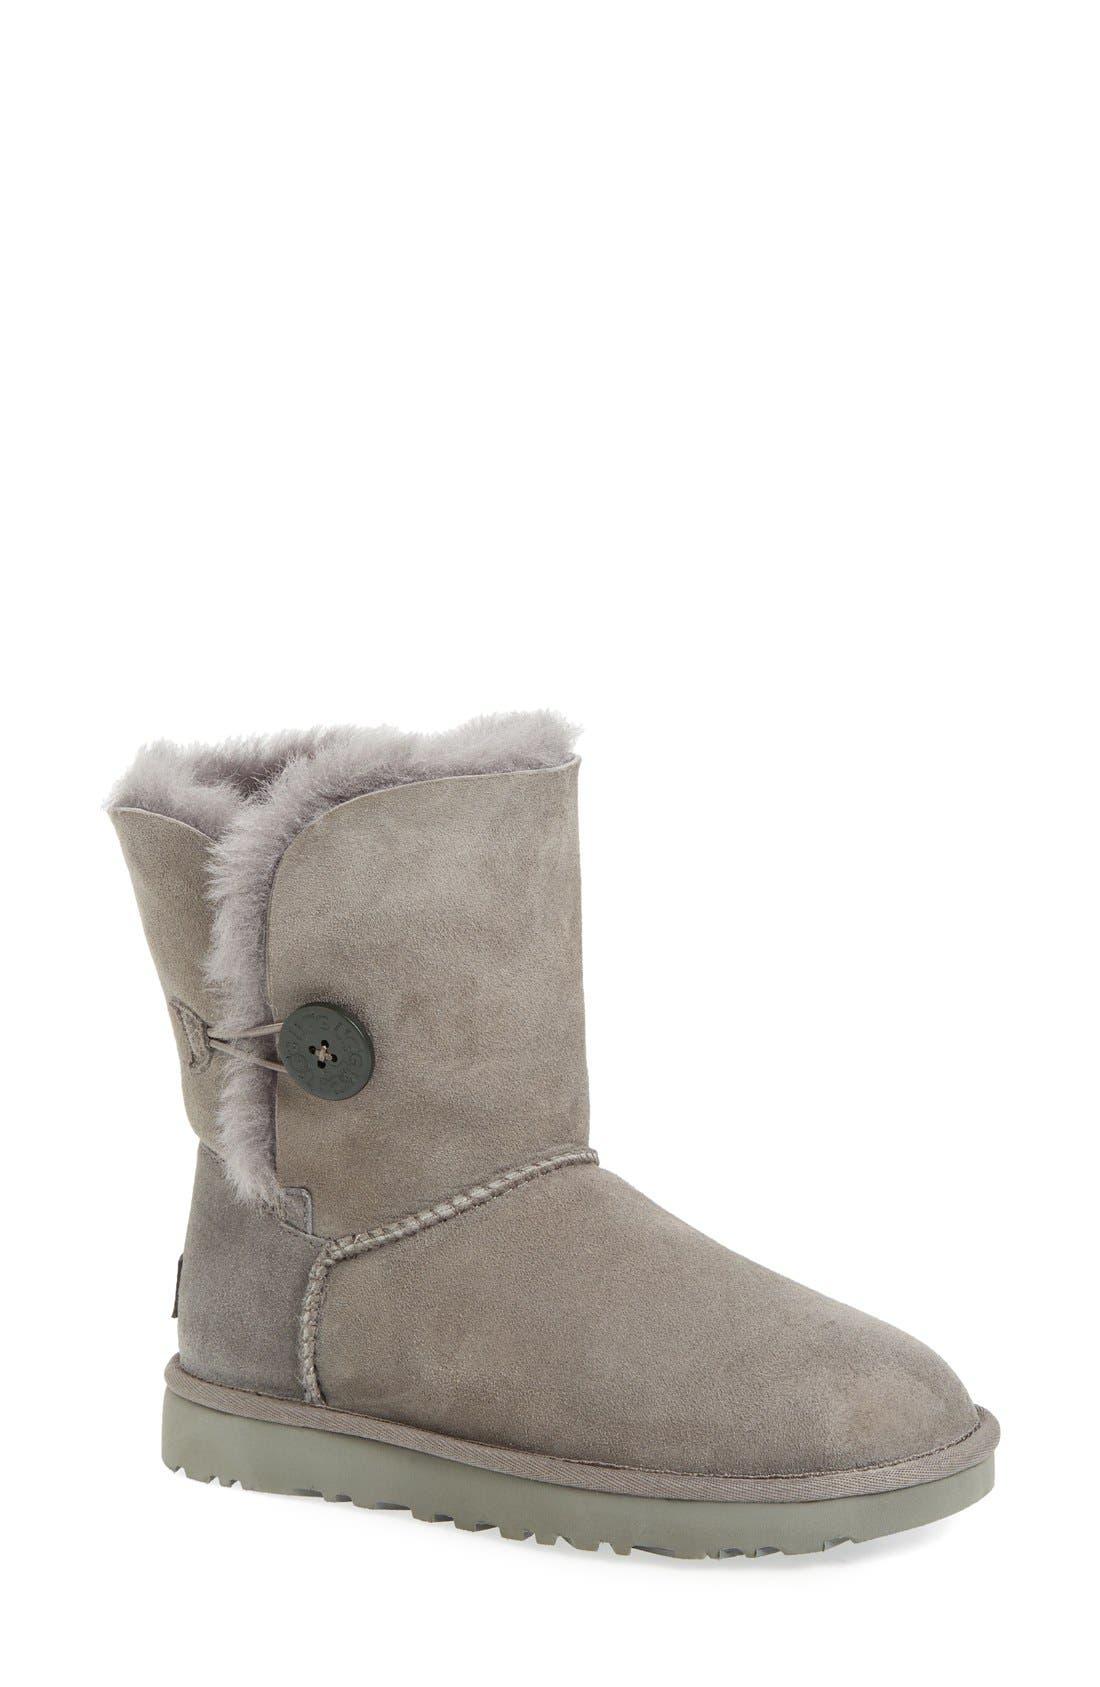 Alternate Image 1 Selected - UGG® 'Bailey Button II' Boot (Women)